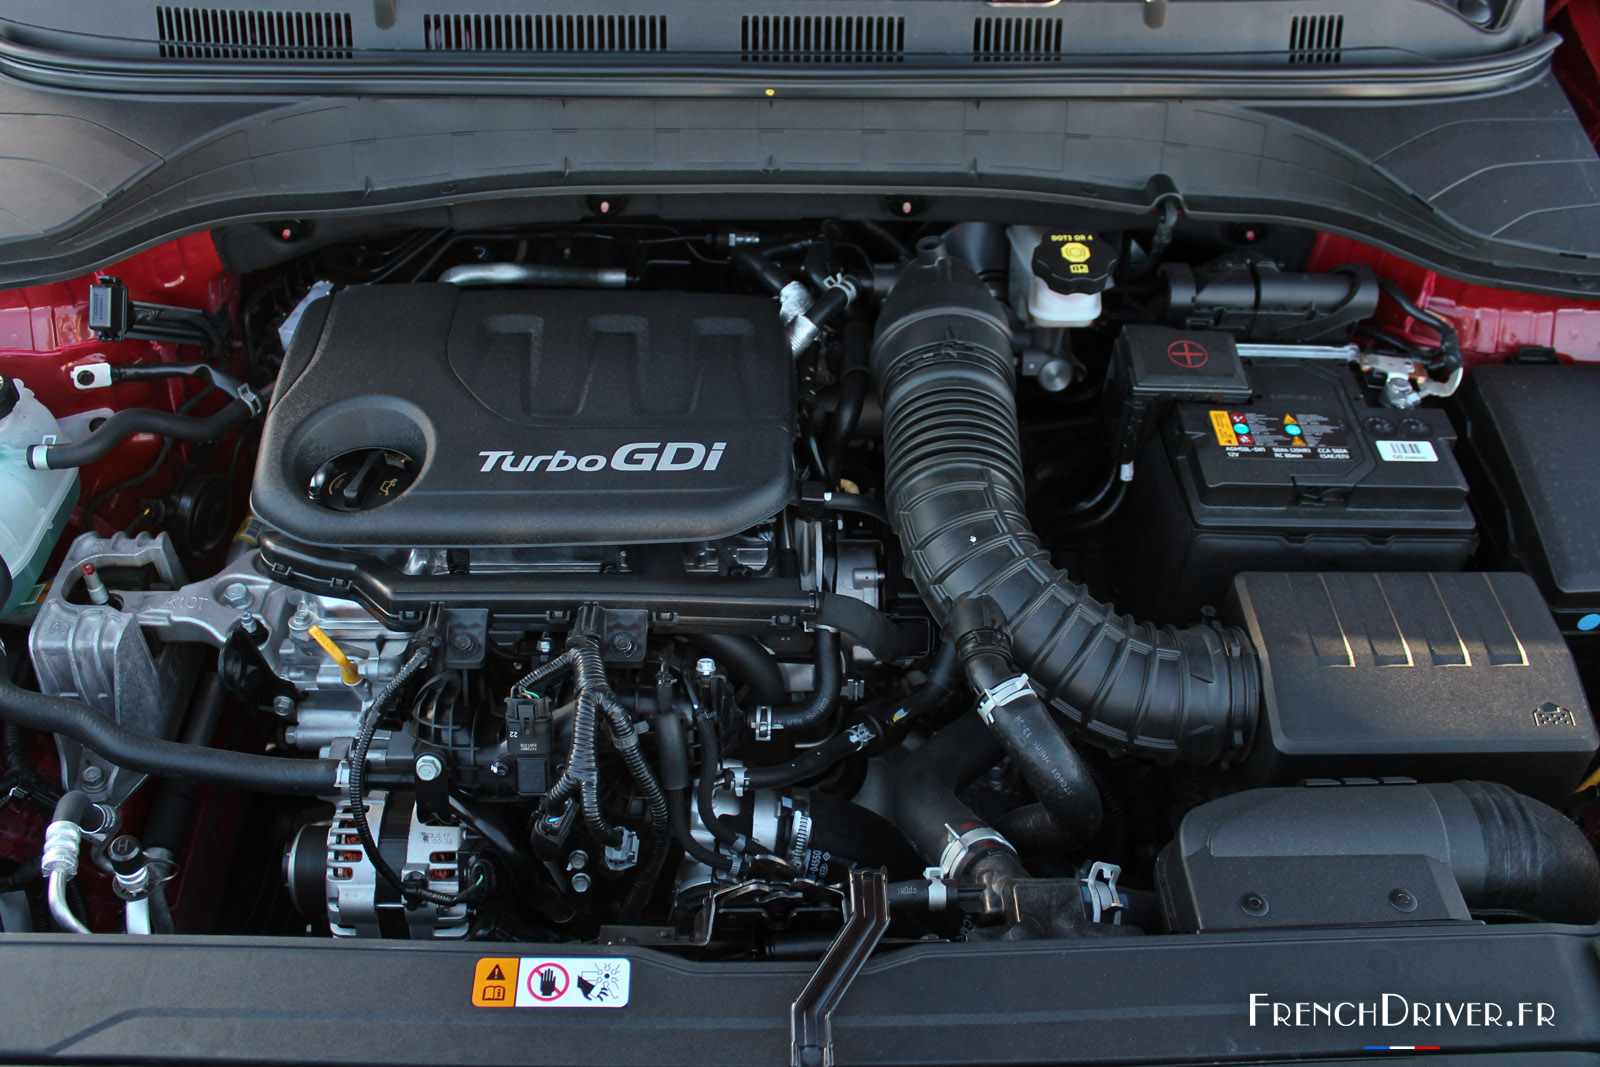 Hyundai Kona Fiche Technique >> Essai Hyundai Kona Le Suv Urbain Et Audacieux French Driver